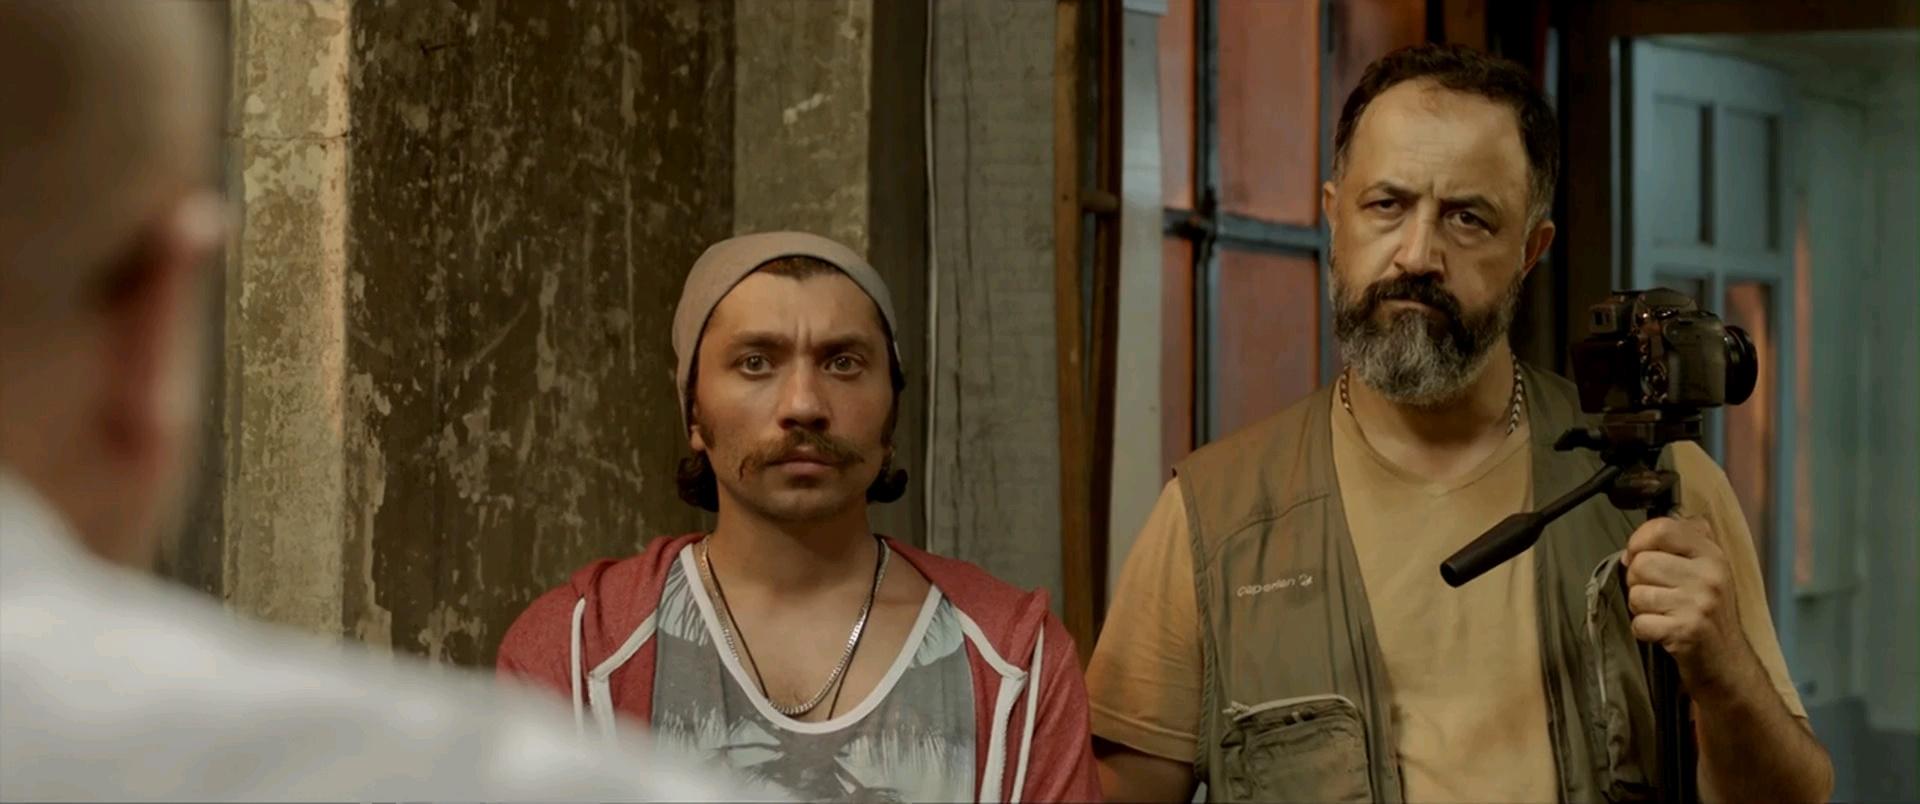 Ölümlü Dünya | 2018 | Yerli Film | NF | WEB-DL | XviD | Sansürsüz | 1080p - m720p - m1080p | WEB-DL | Tek Link